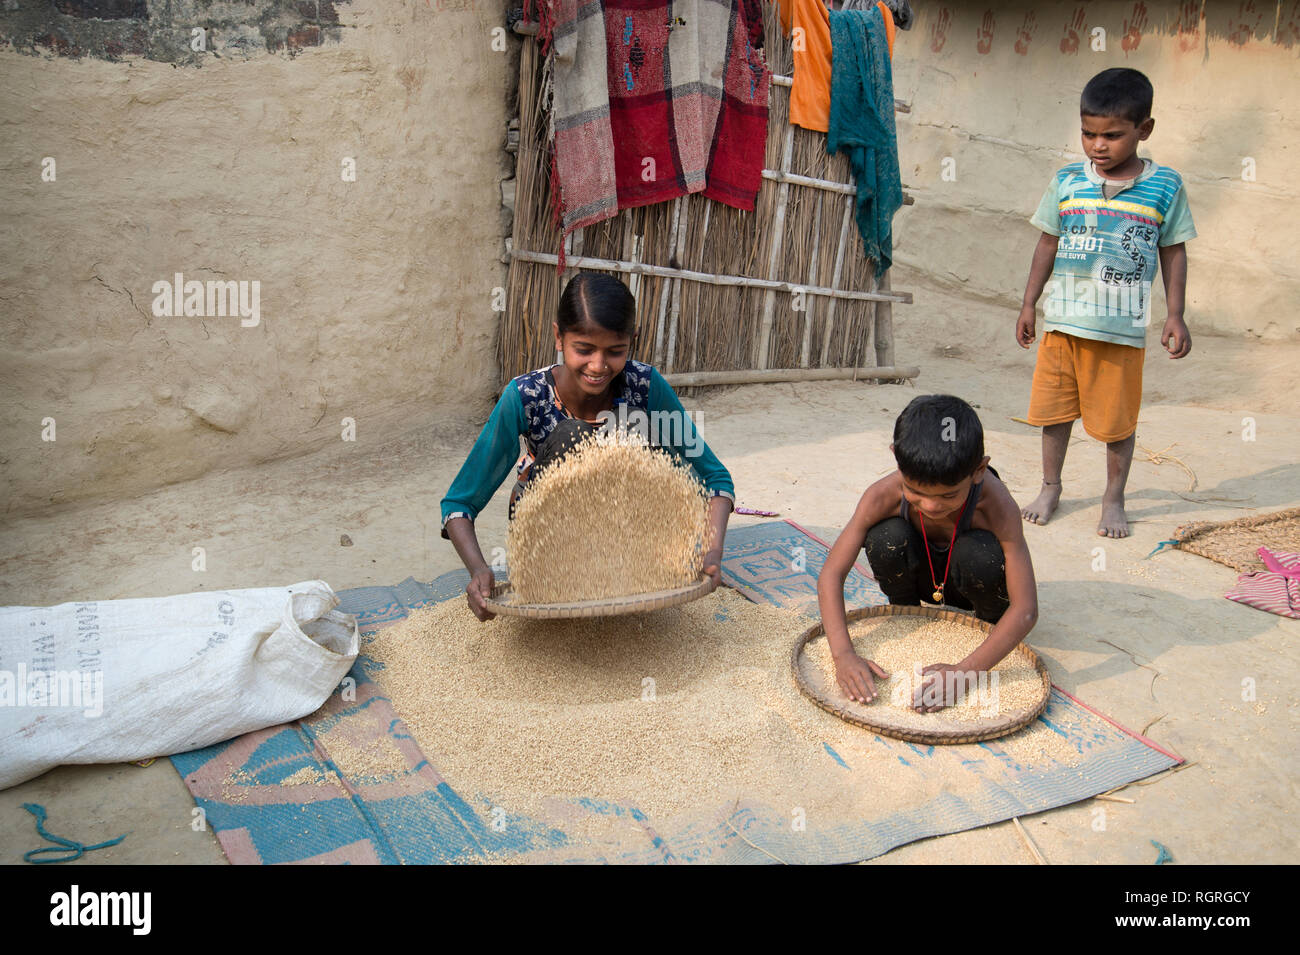 Bihar Village Stock Photos & Bihar Village Stock Images - Alamy